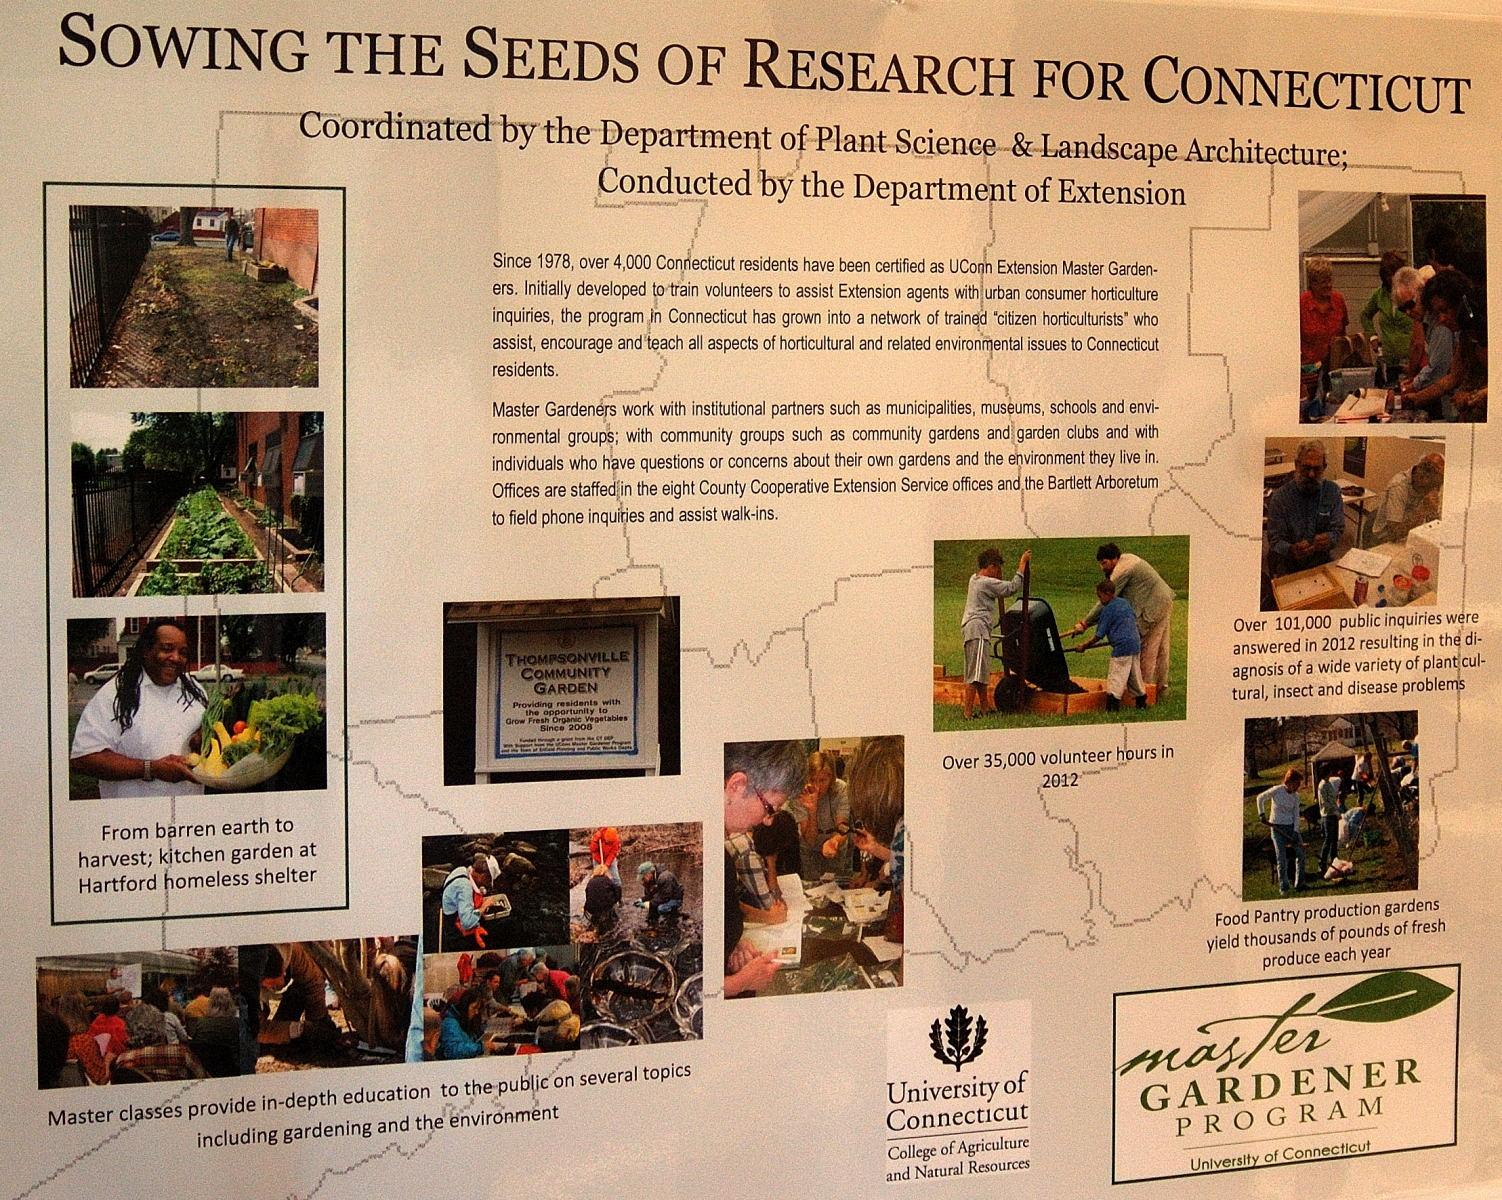 Uconn Master Gardener Program Uconnladybug 39 S Blog